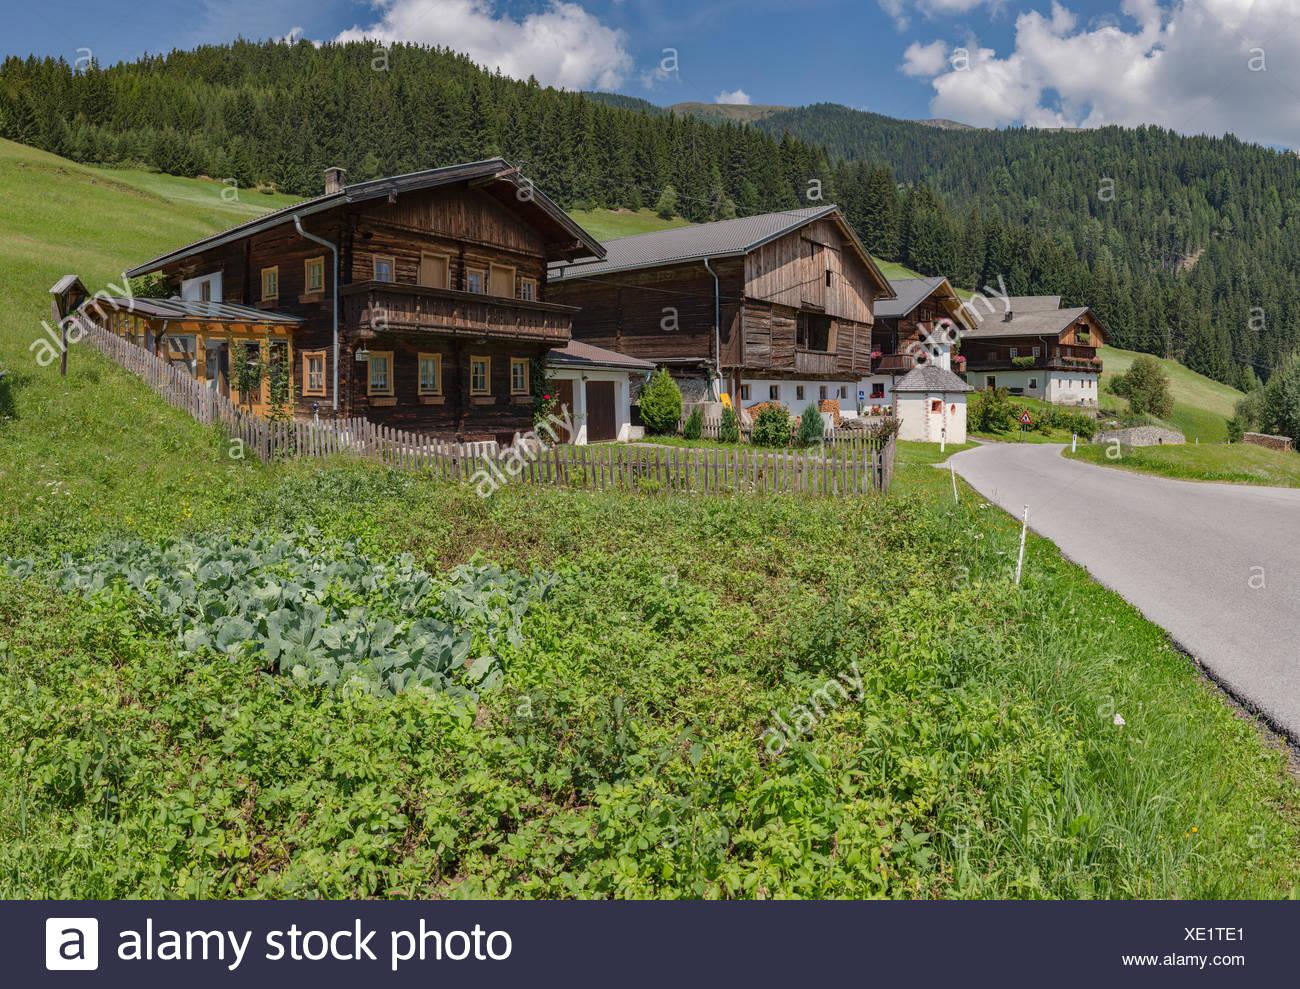 Kosten,Austria,Farmhouses along the Pustertaler Höhenstrasse - Stock Image